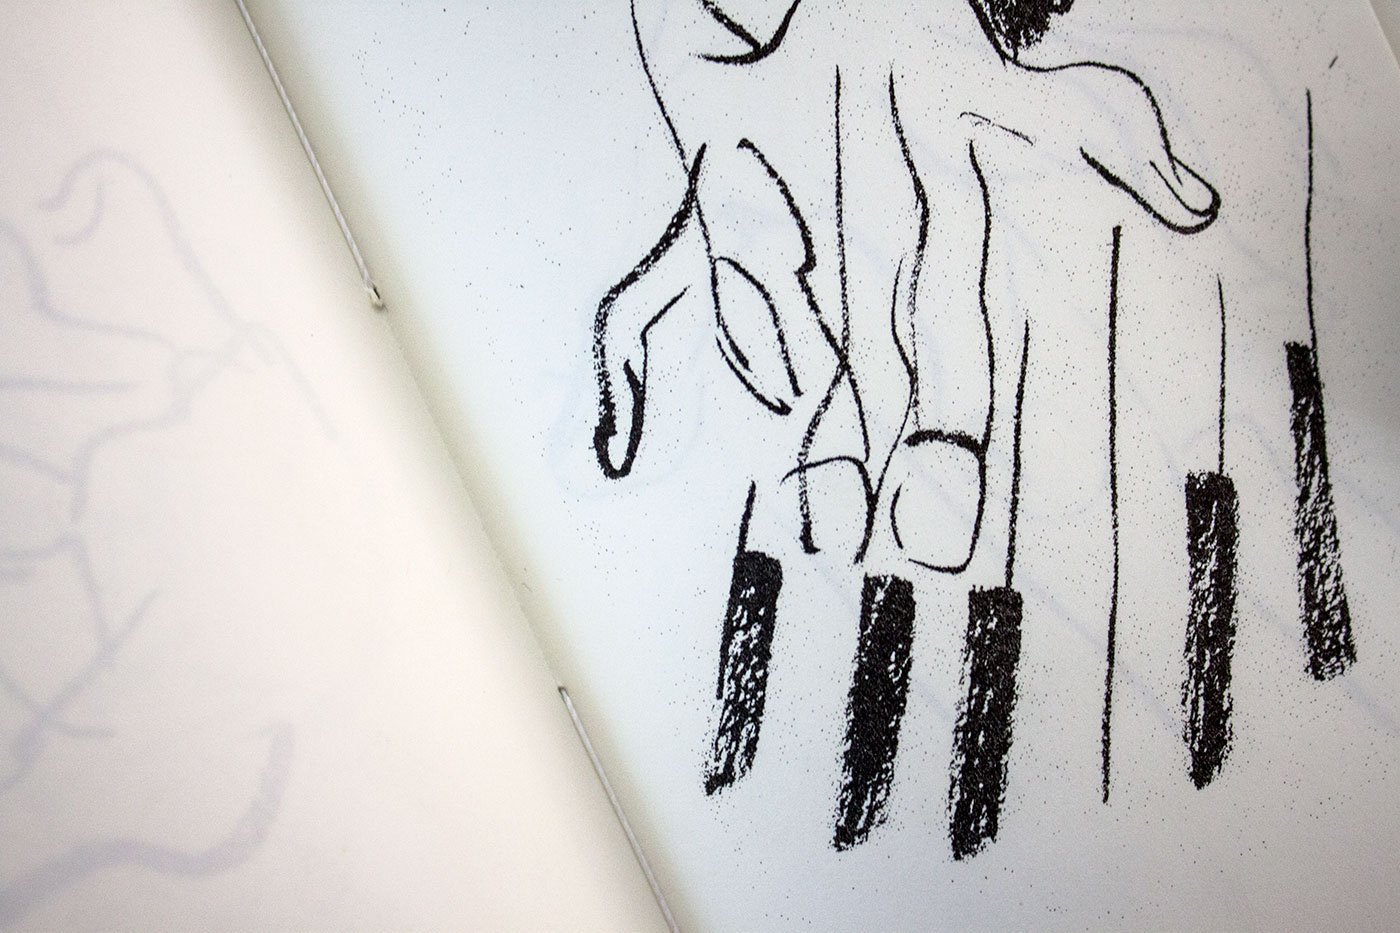 illustration made by Nicola Giorgio